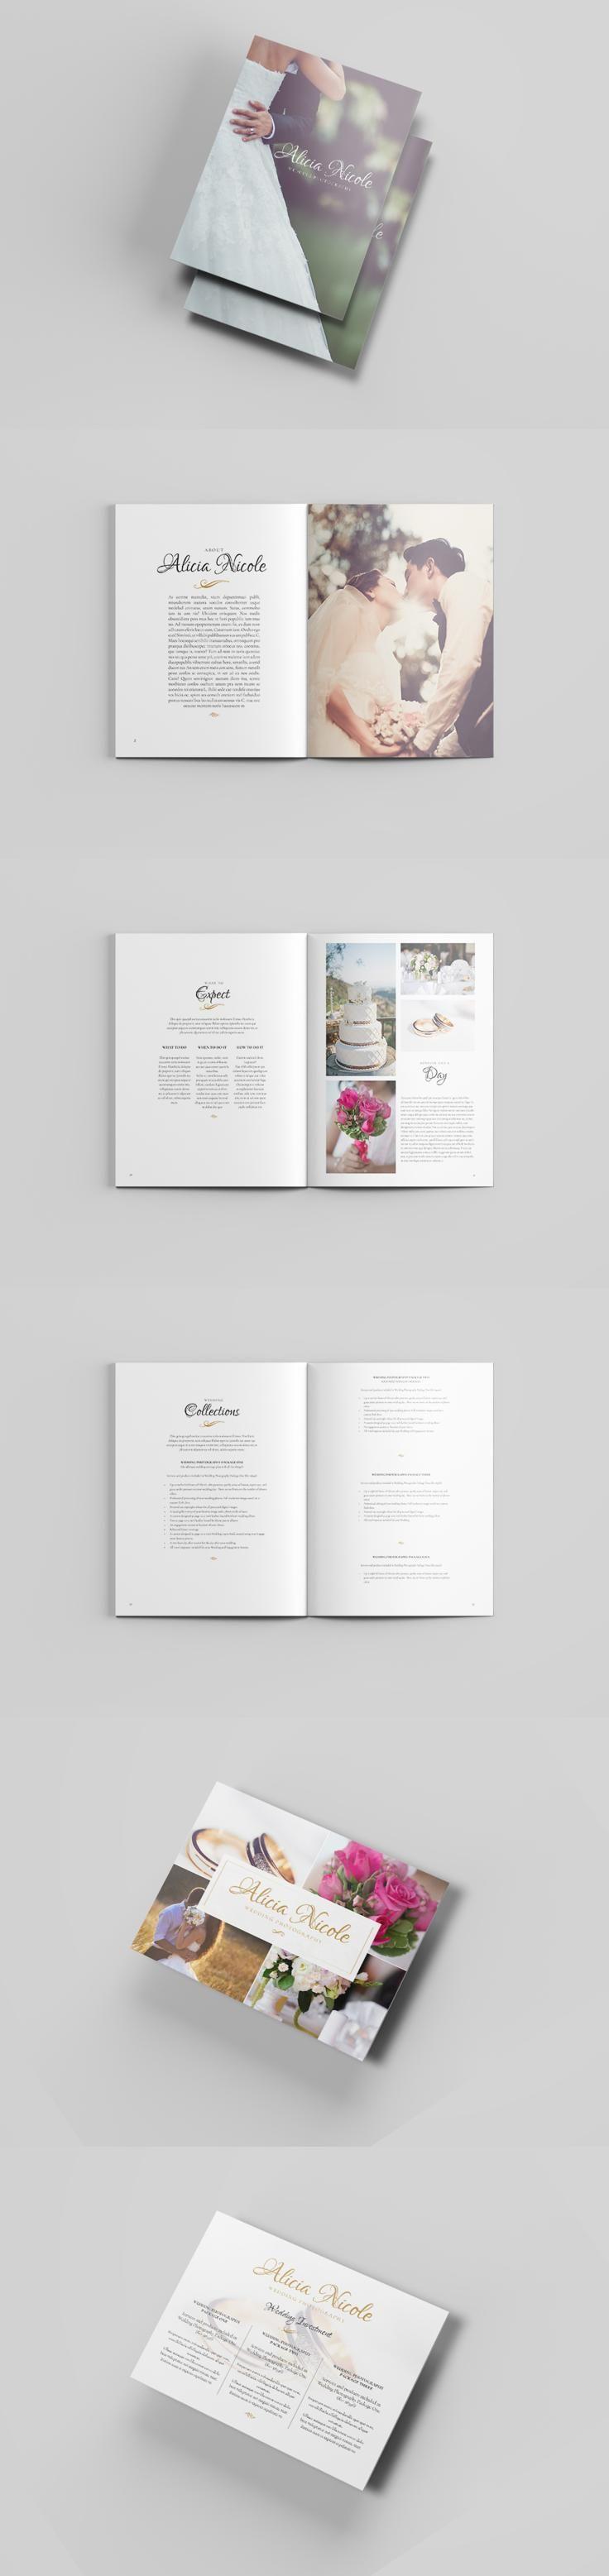 #magazine #design from Harrell Design Studio | DOWNLOAD: https://creativemarket.com/harrellds/534908-Wedding-Photography-Guide-Template?u=zsoltczigler